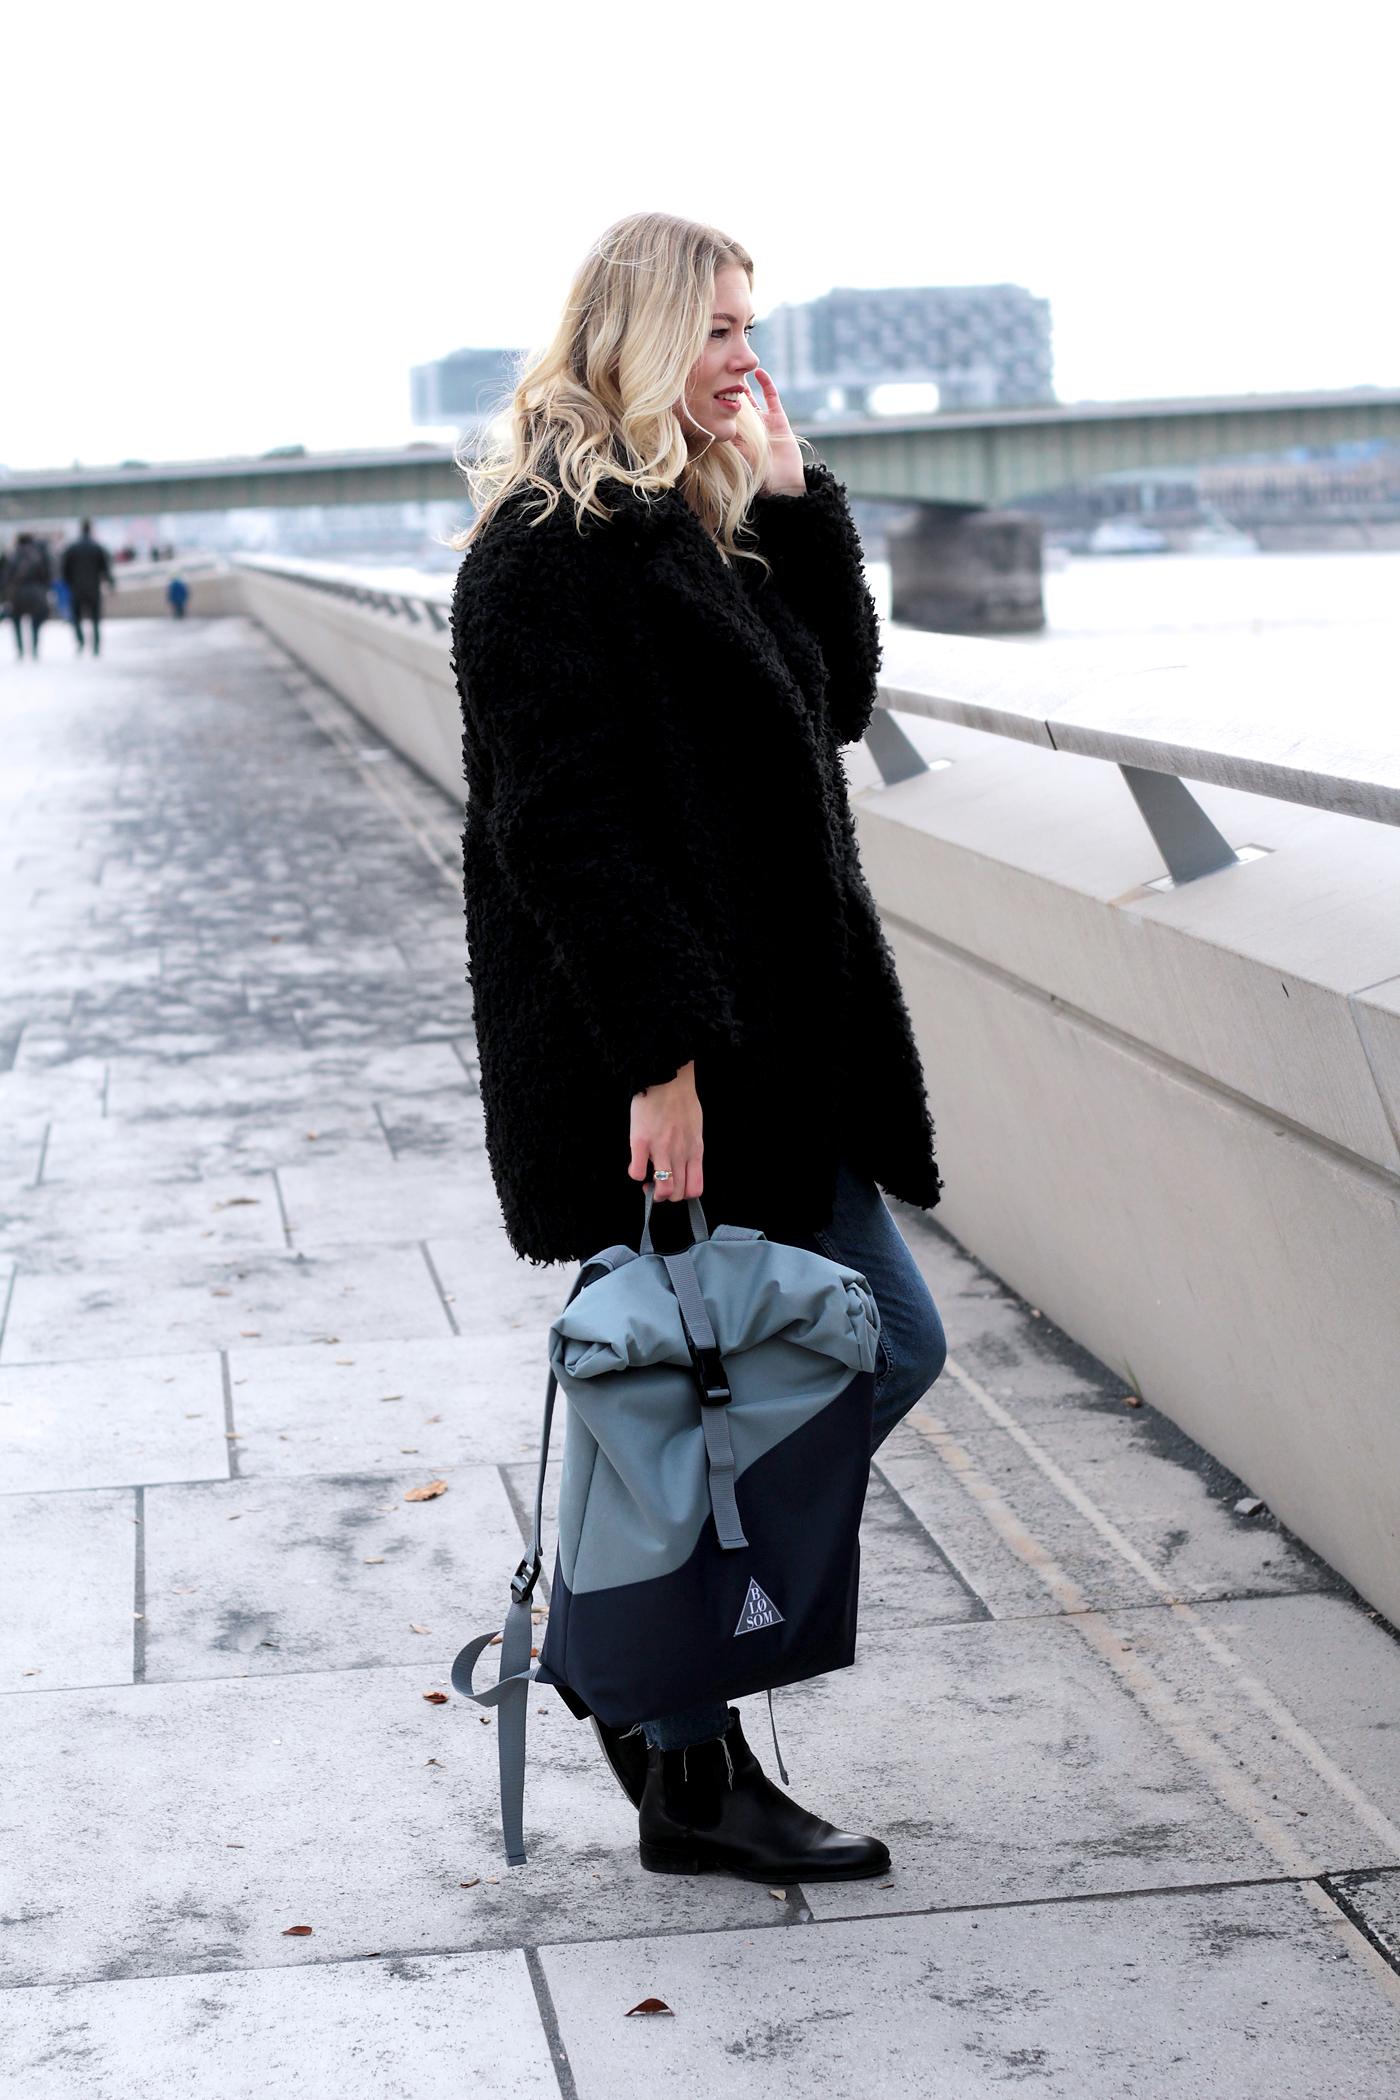 somehappyshoes_travelblog_blosom_backpack_cologne